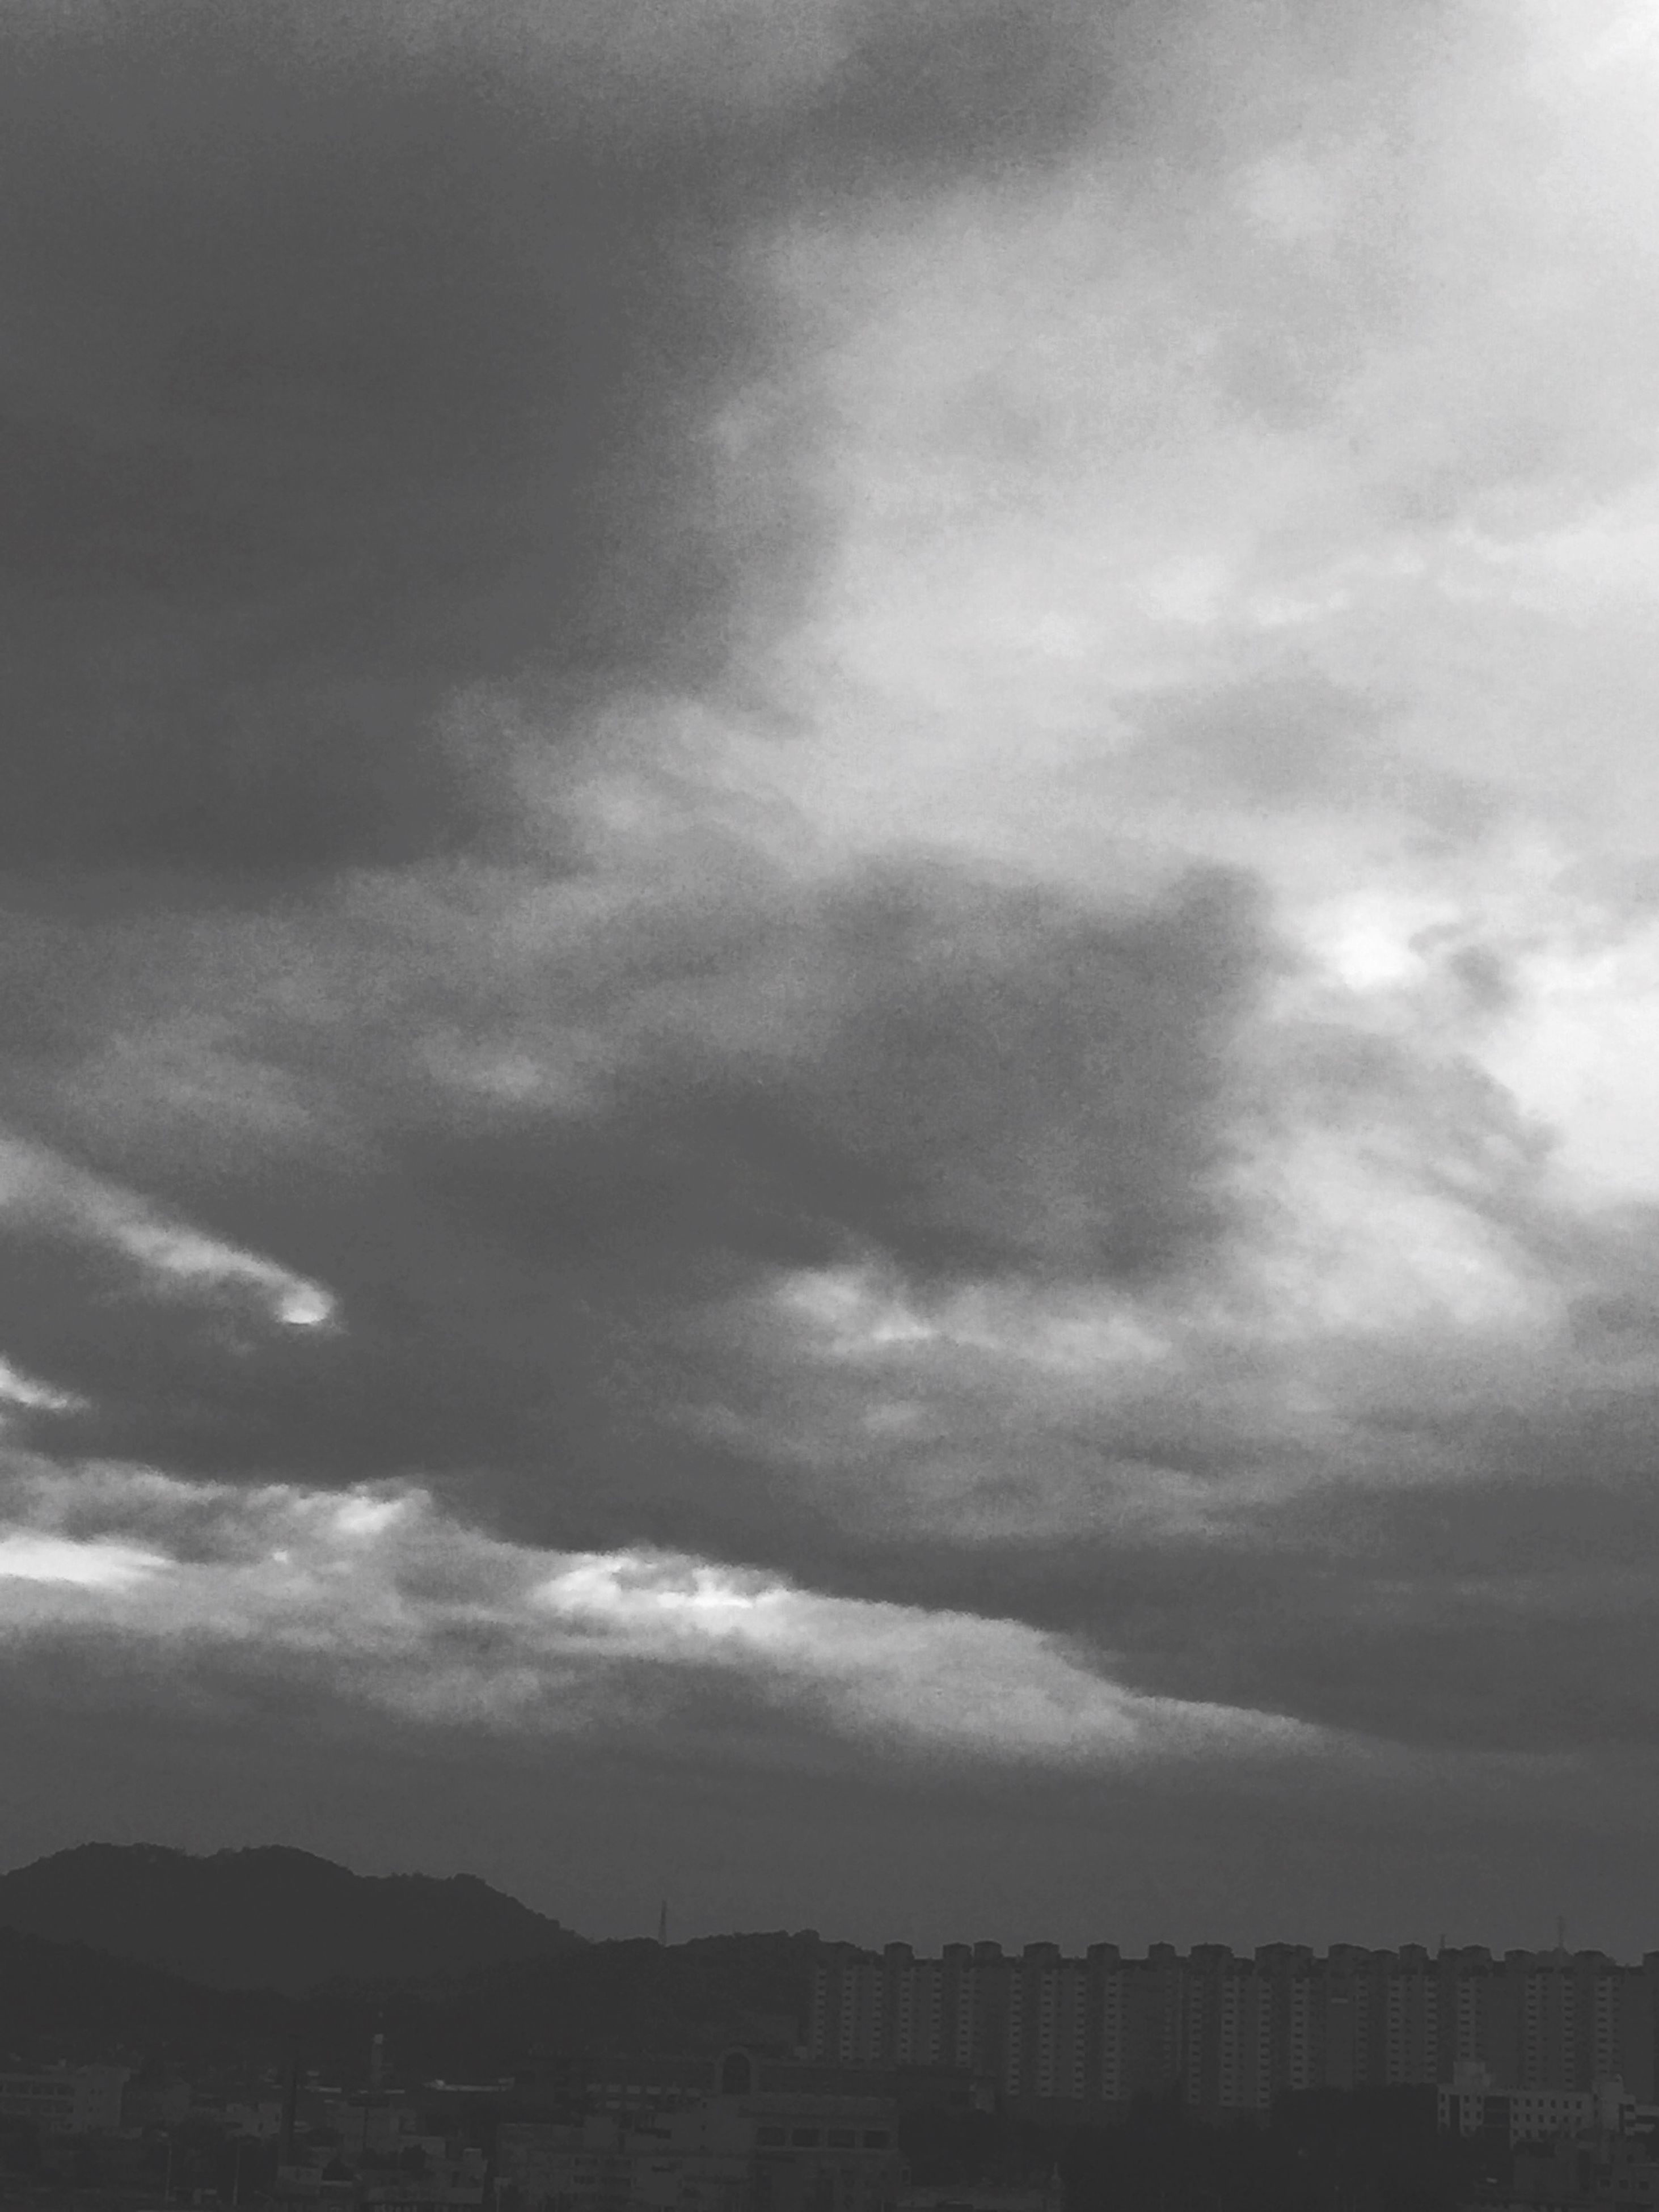 sky, cloud - sky, building exterior, architecture, built structure, cloudy, weather, mountain, overcast, cloud, scenics, nature, beauty in nature, city, house, dusk, residential structure, residential building, outdoors, cloudscape